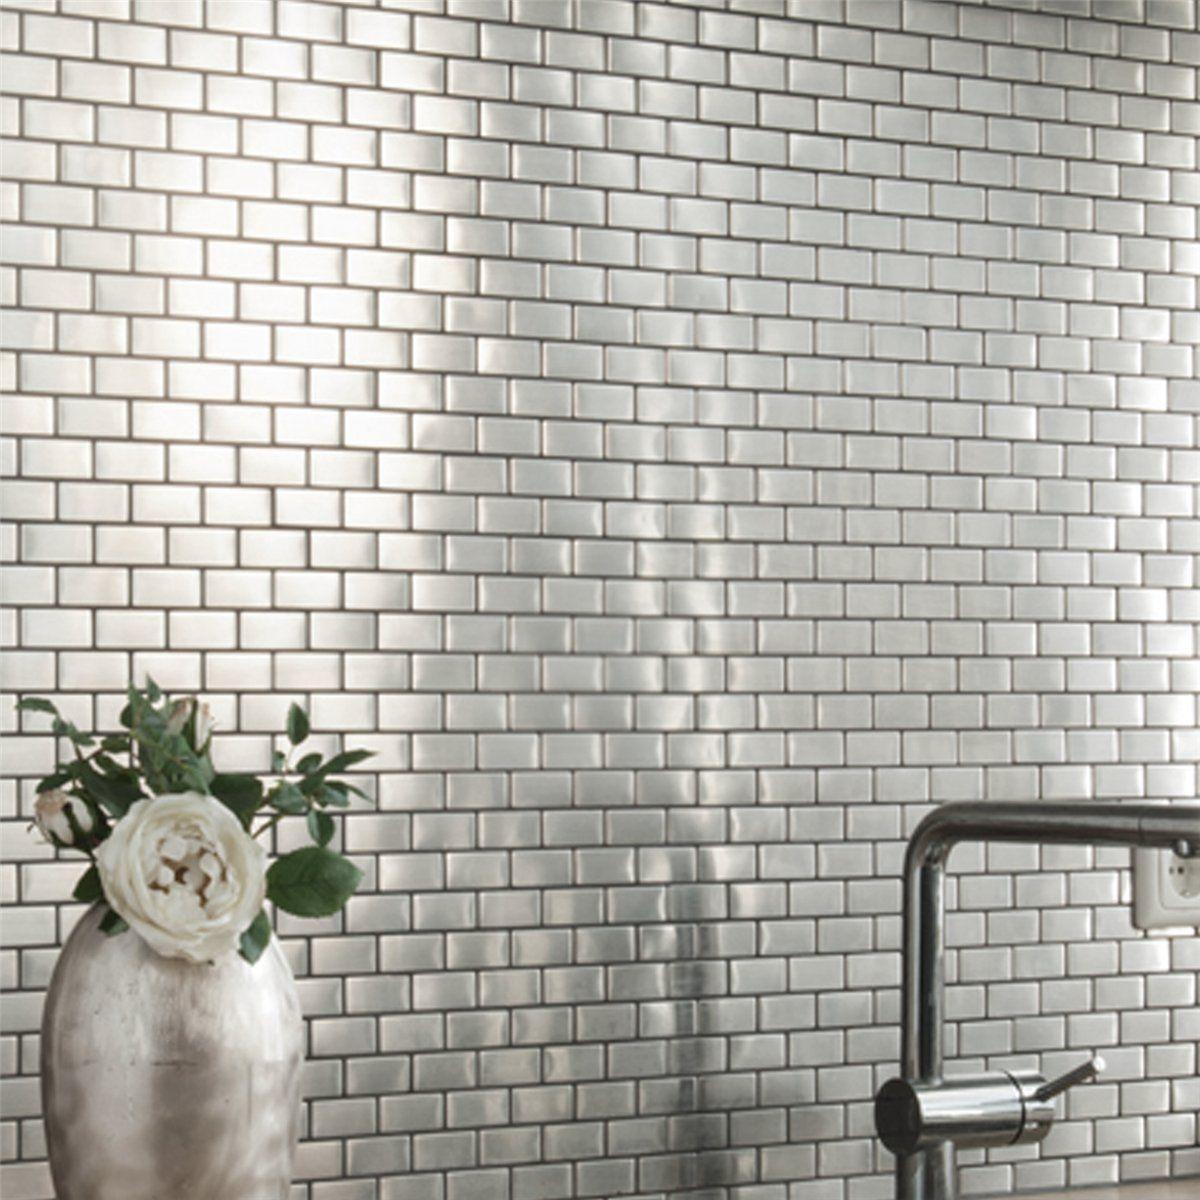 edelstahl mosaik fliesen silber 23x48x8mm fliesenspiegel pinterest edelstahl fliesen und. Black Bedroom Furniture Sets. Home Design Ideas